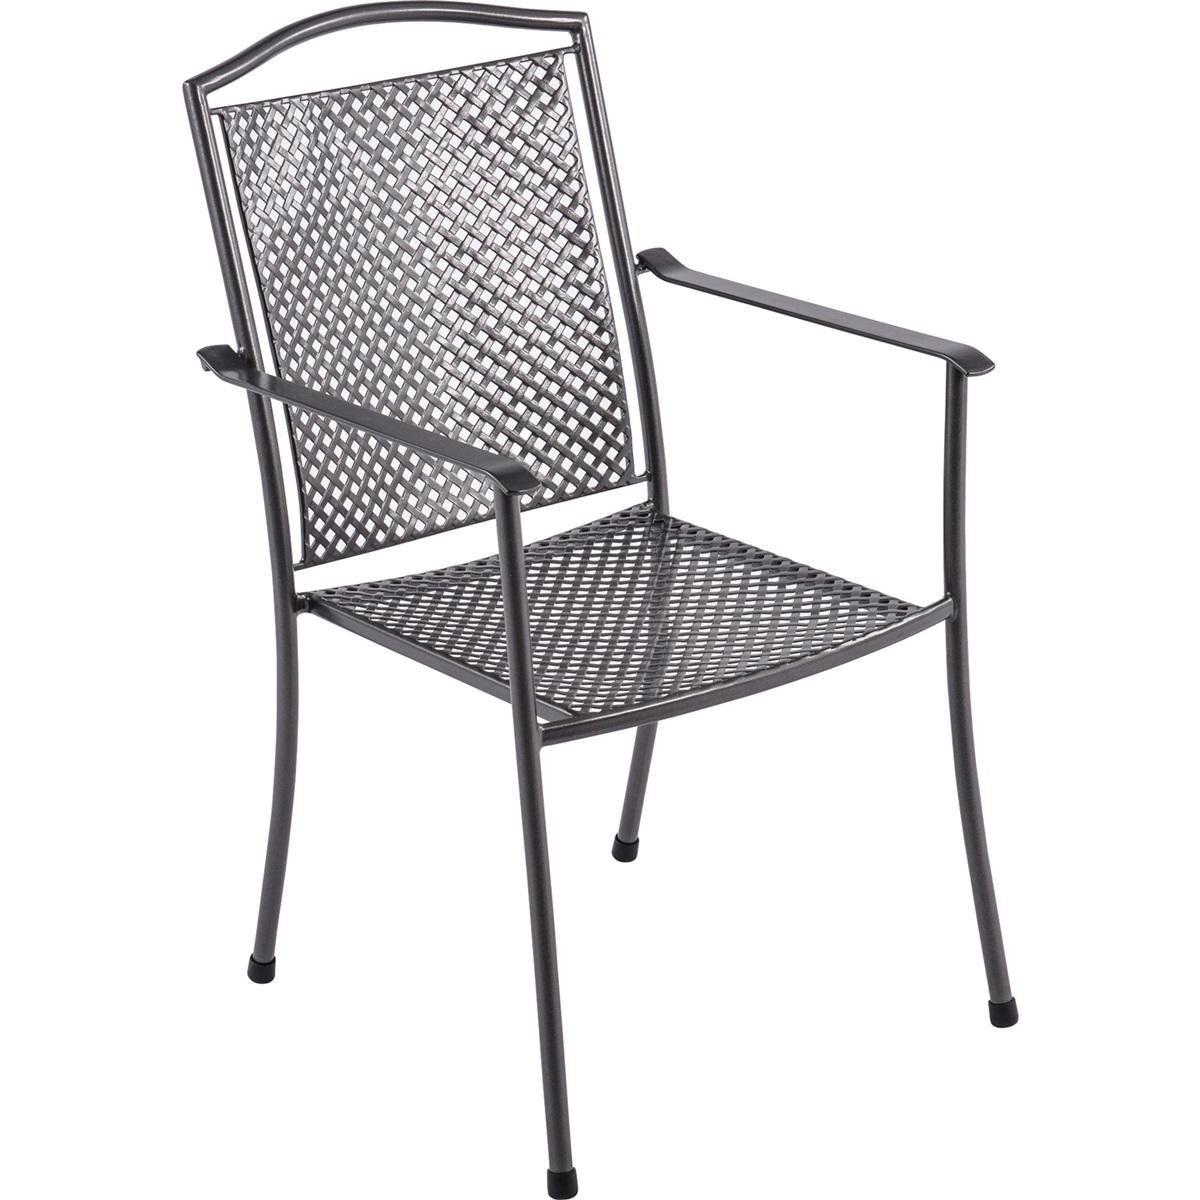 Royal Garden Domino steel, stohovatelná židle z tahokovu 66,5 x 55,5 x 92,5 cm